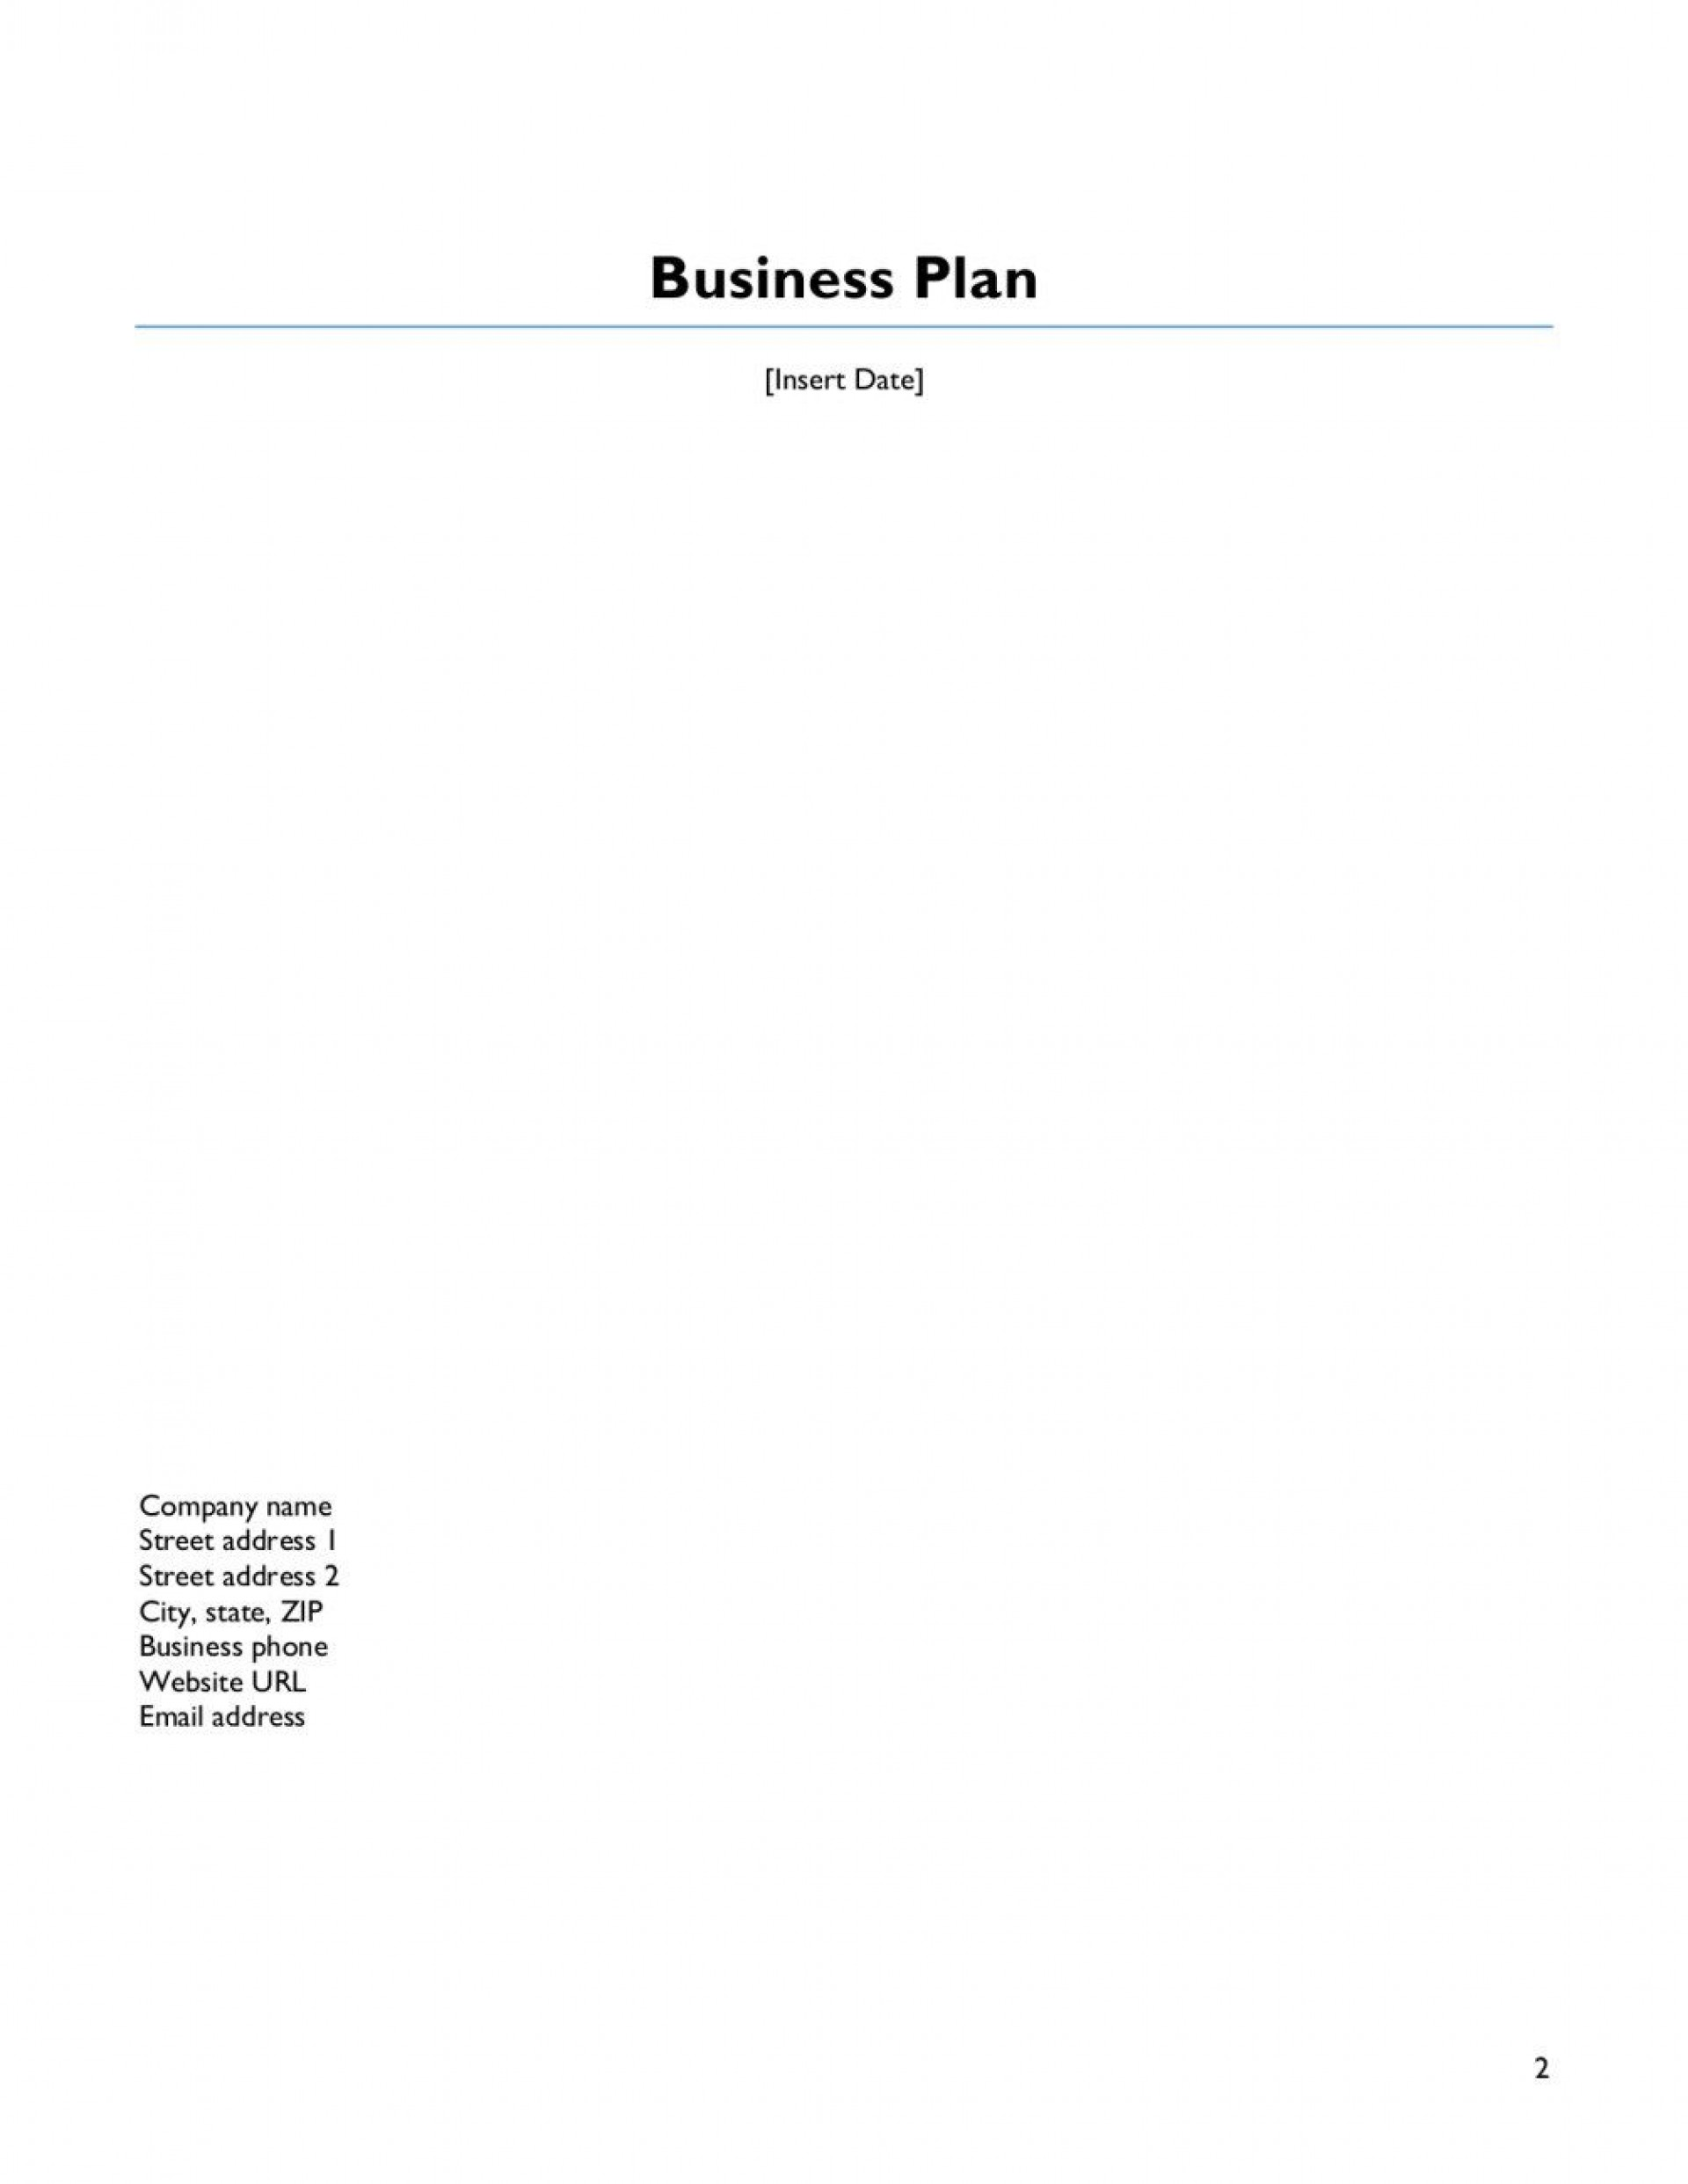 009 Astounding Score Deluxe Startup Busines Plan Template High Def  Score-deluxe-startup-business-plan-template 1.docx1920